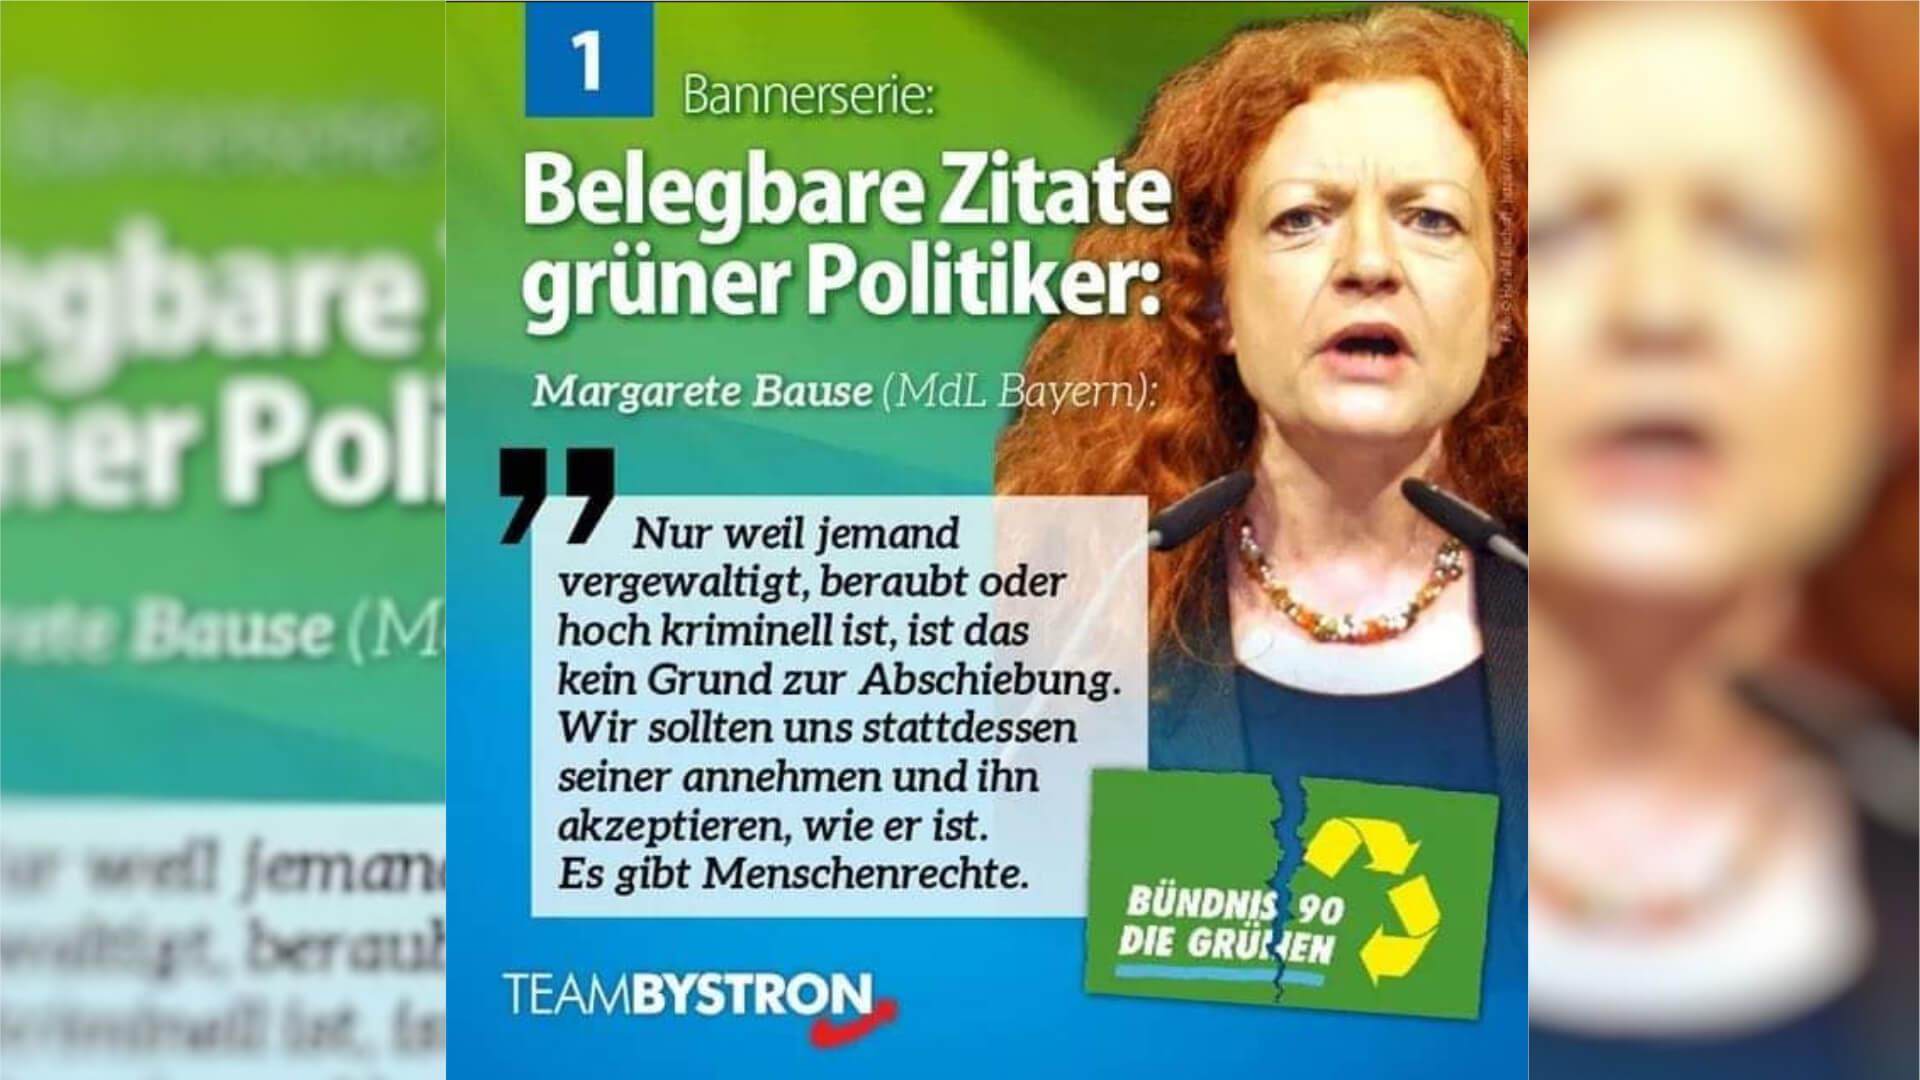 Zitat Margarete Bause (Bündnis 90/Grüne)